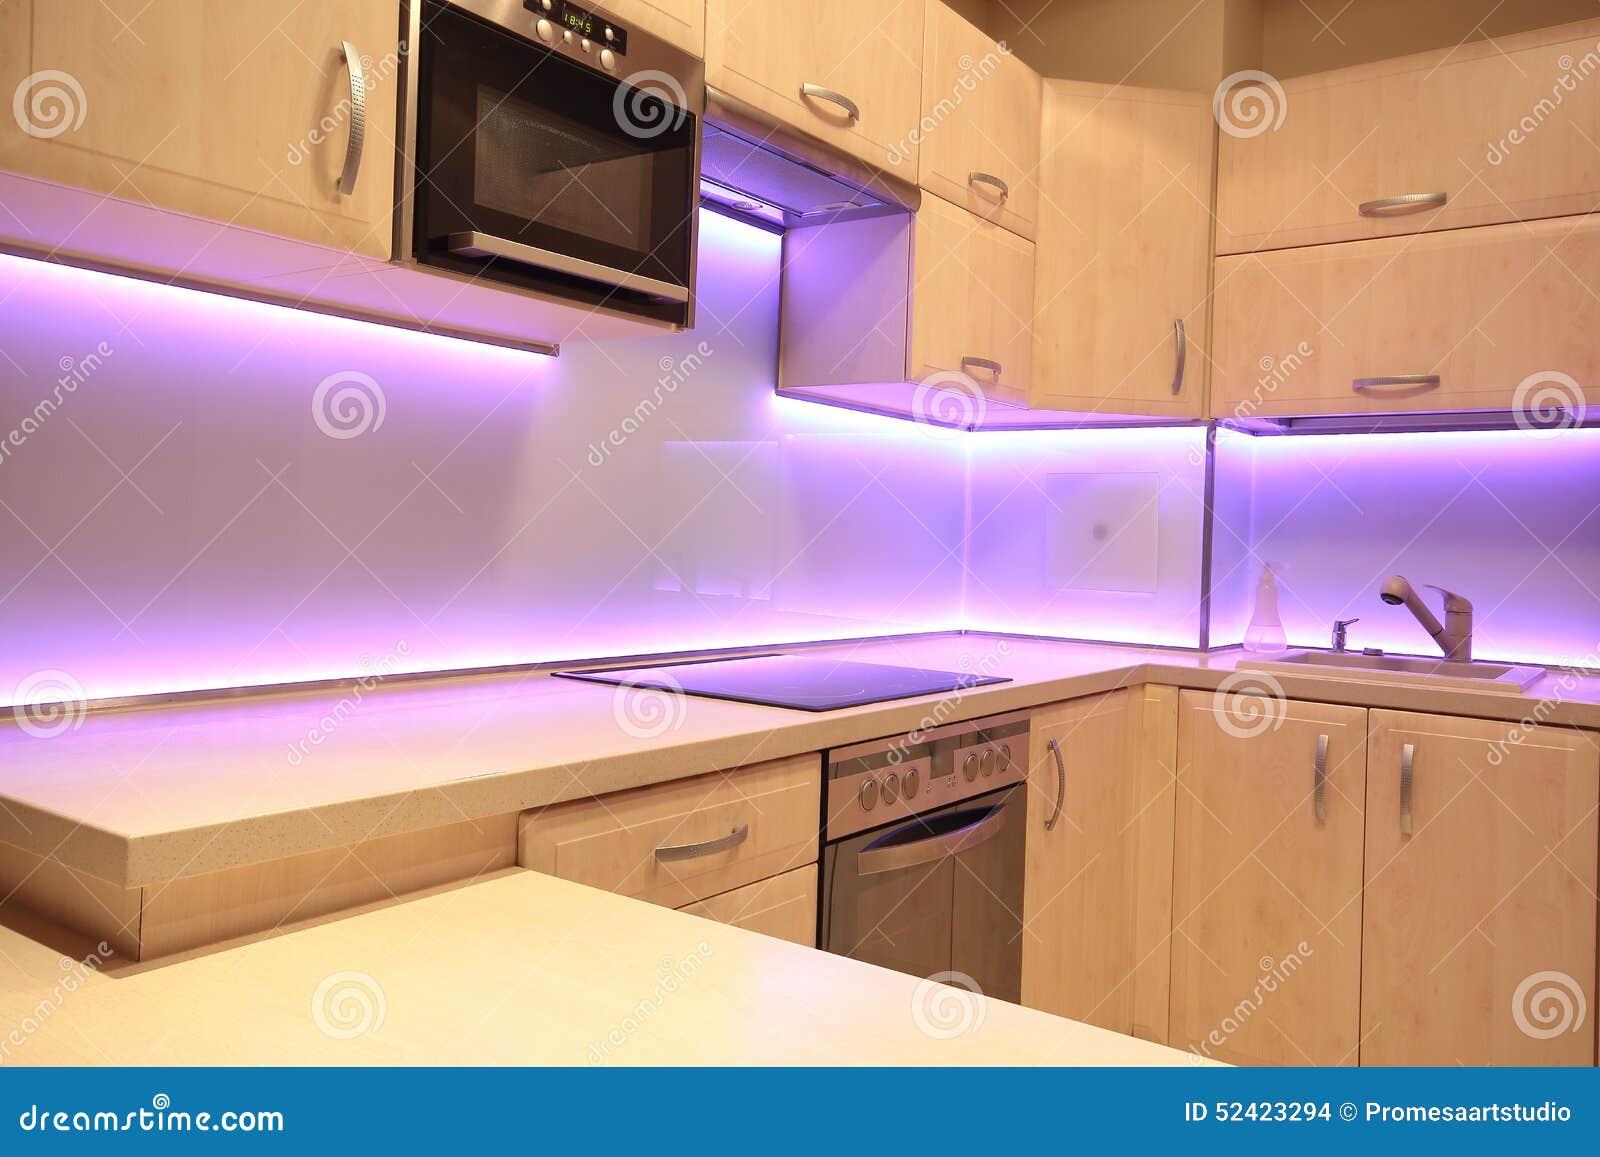 Cocina de lujo moderna con la iluminaci n rosada del led - Iluminacion cocina led ...